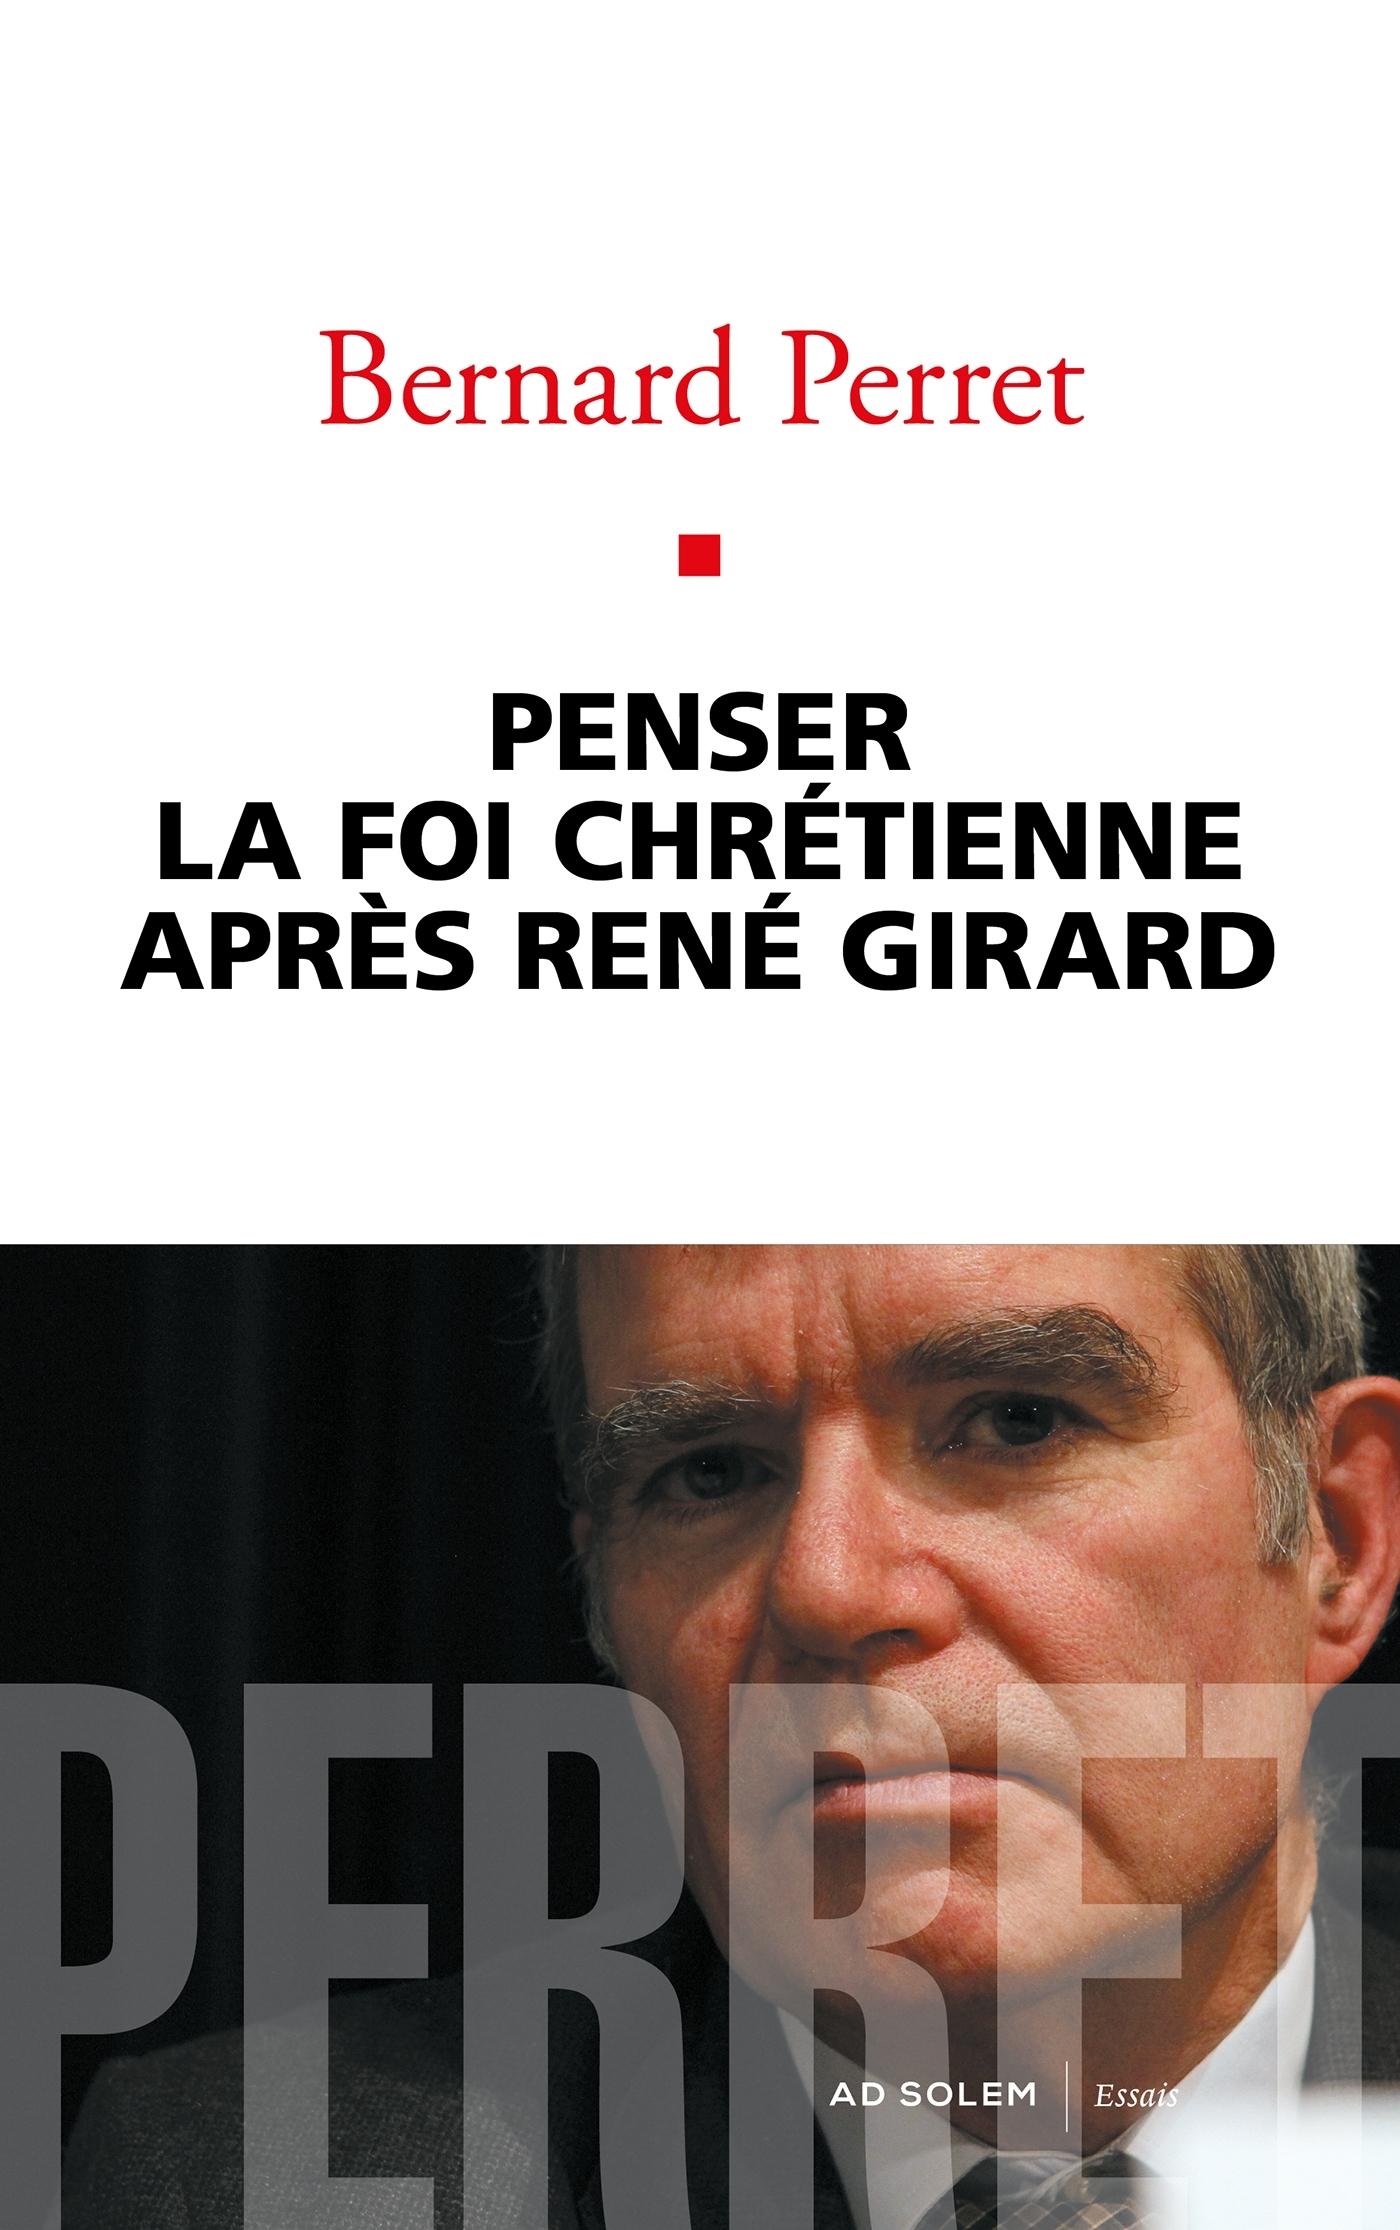 PENSER LA FOI CHRETIENNE APRES RENE GIRARD